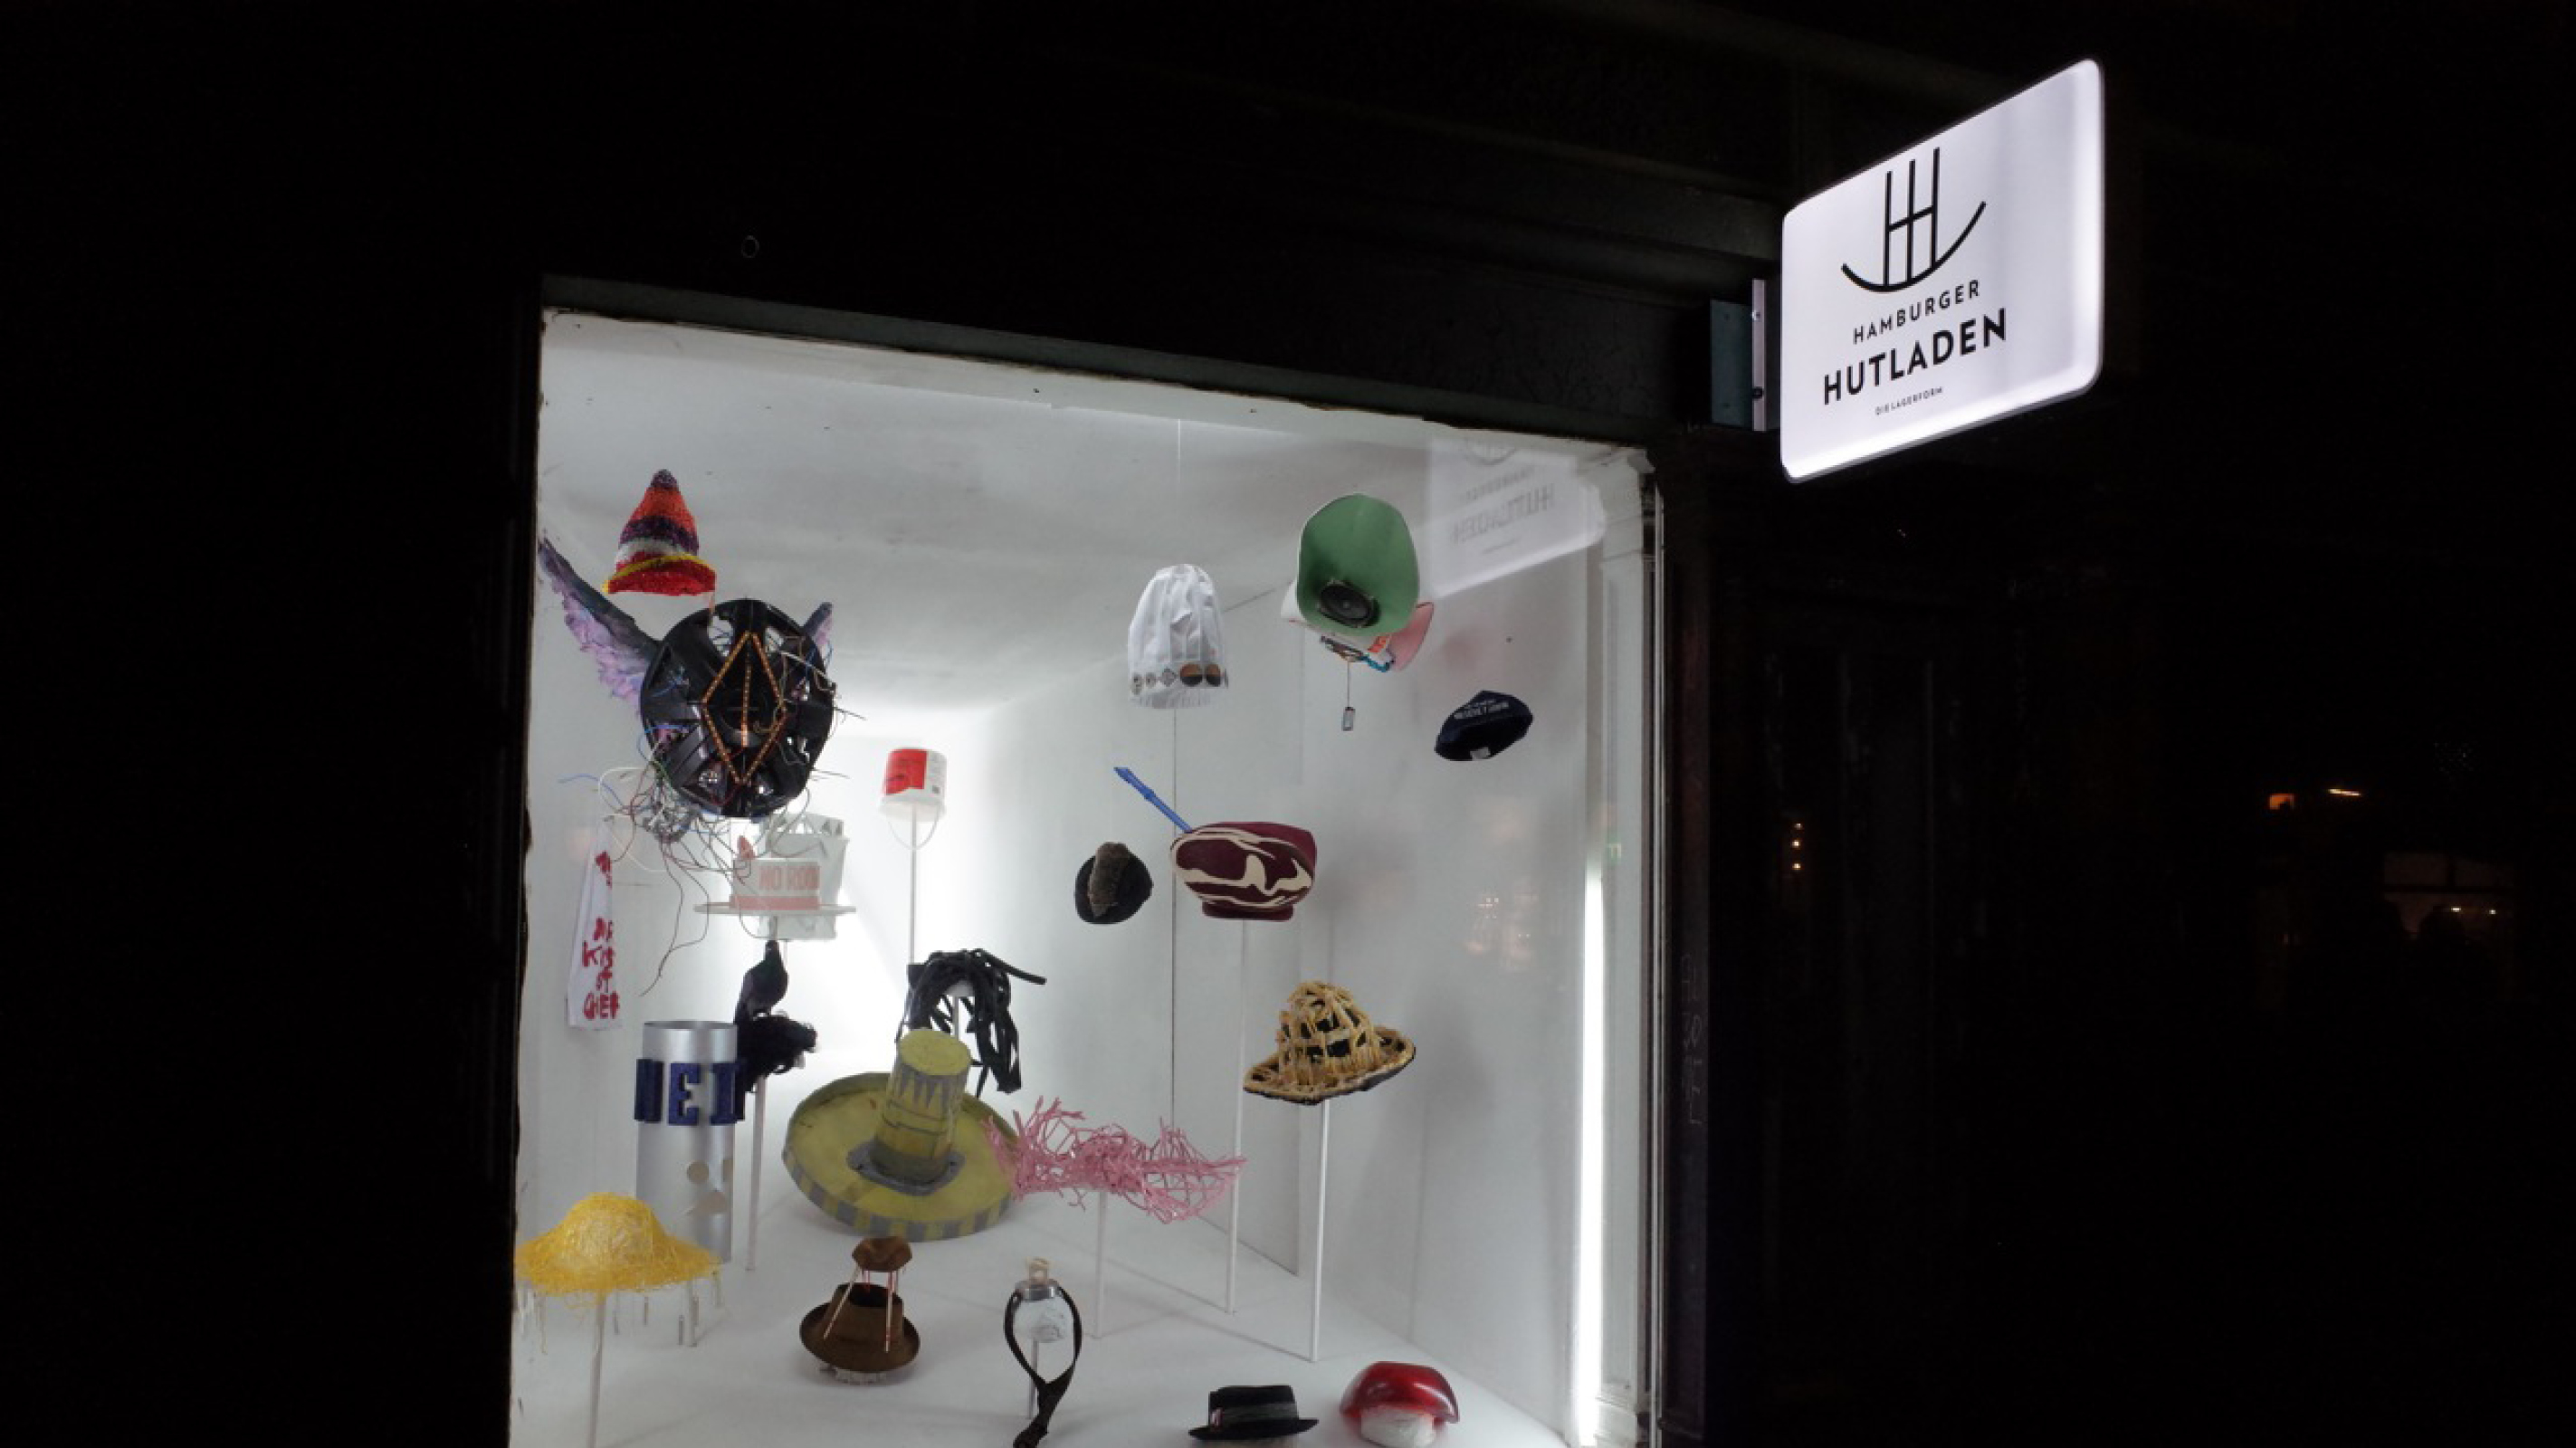 Hamburger Hutladen Noroomgallery – Poarangan Brand Design9